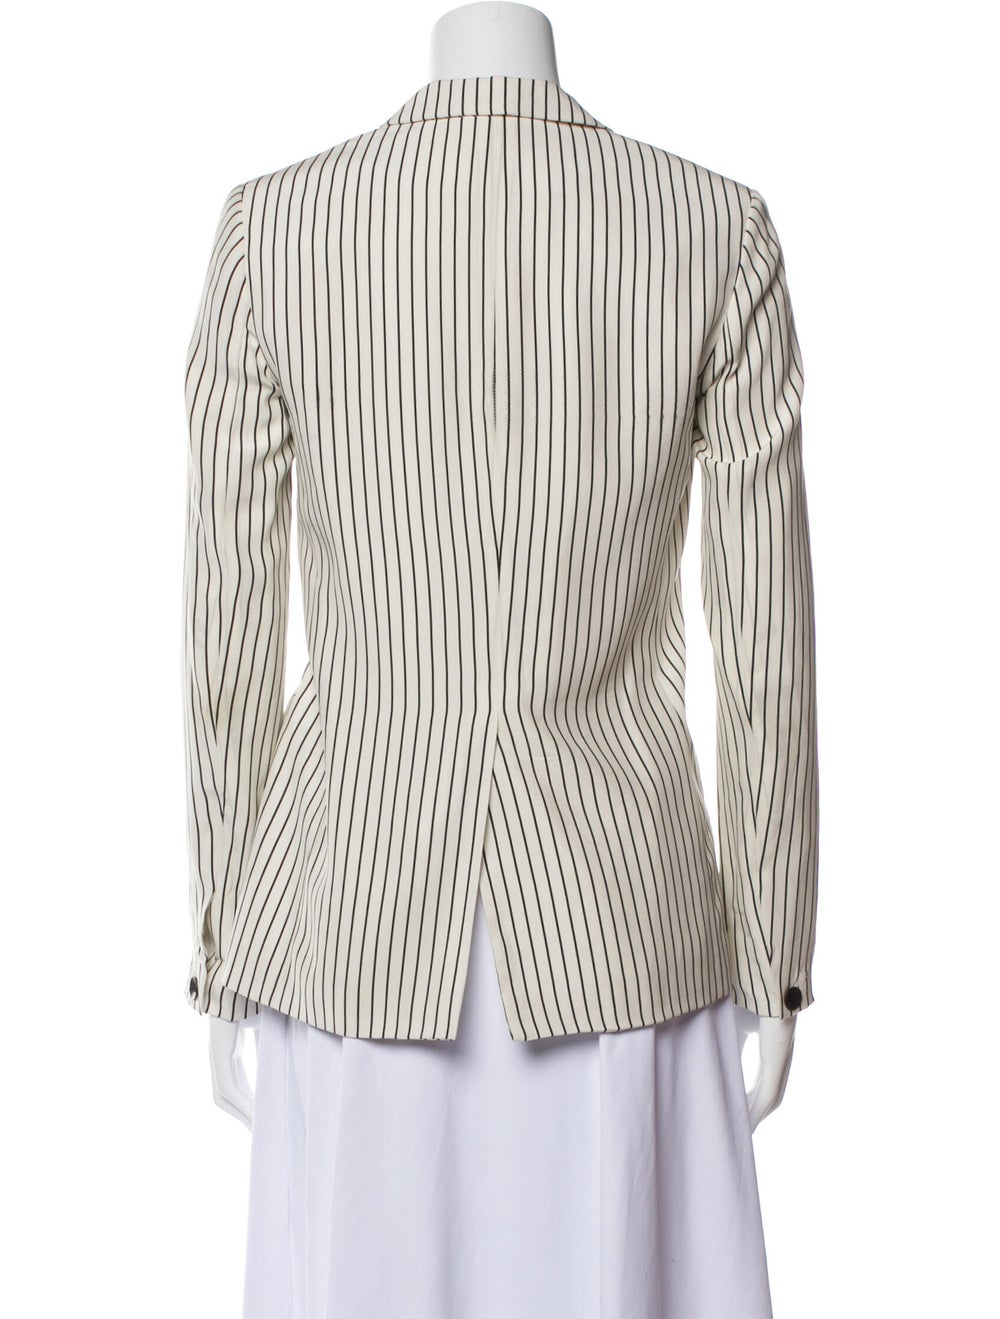 Rag & Bone Silk Striped Blazer - image 3